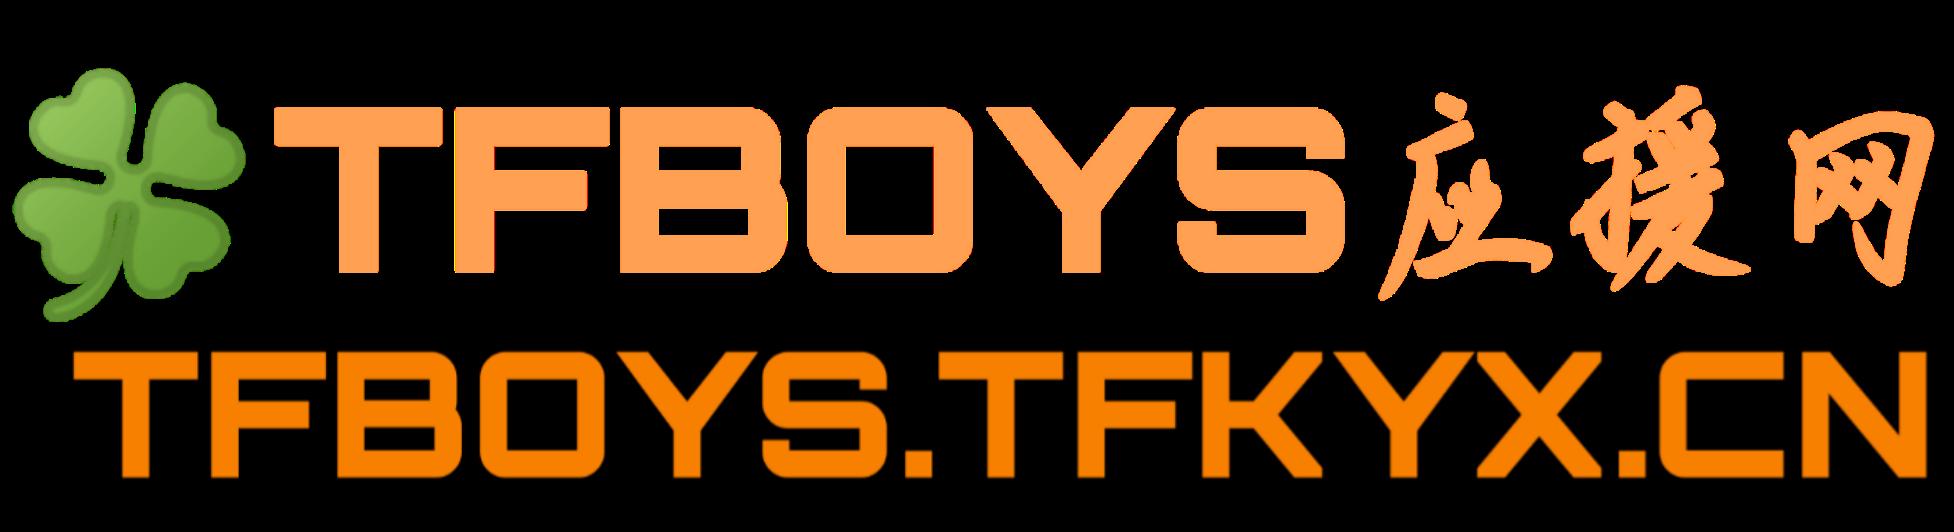 TFBOYS应援网ico^_^